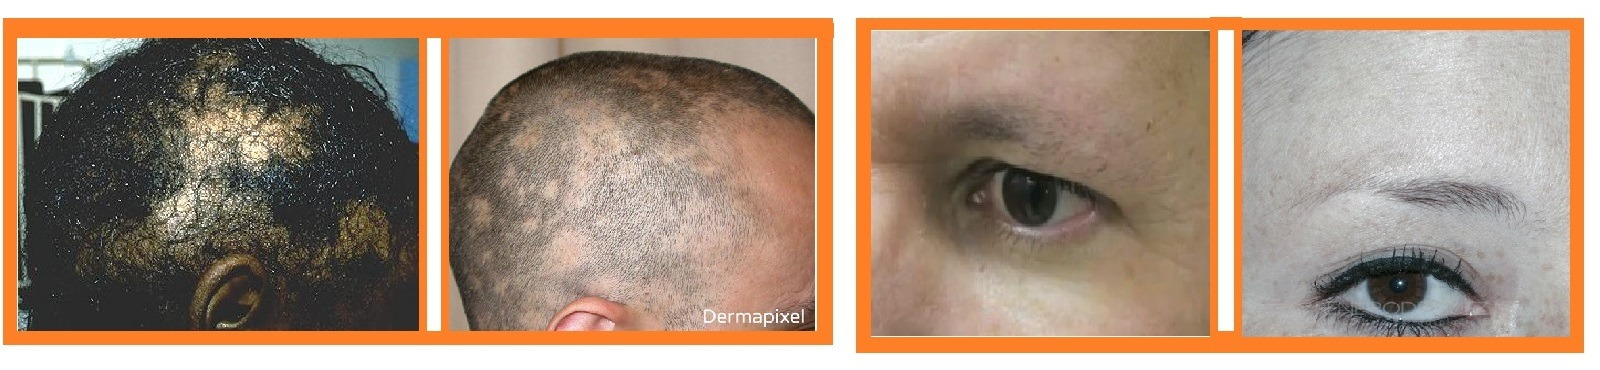 Alopecia sifilítica - Sífilis secundária